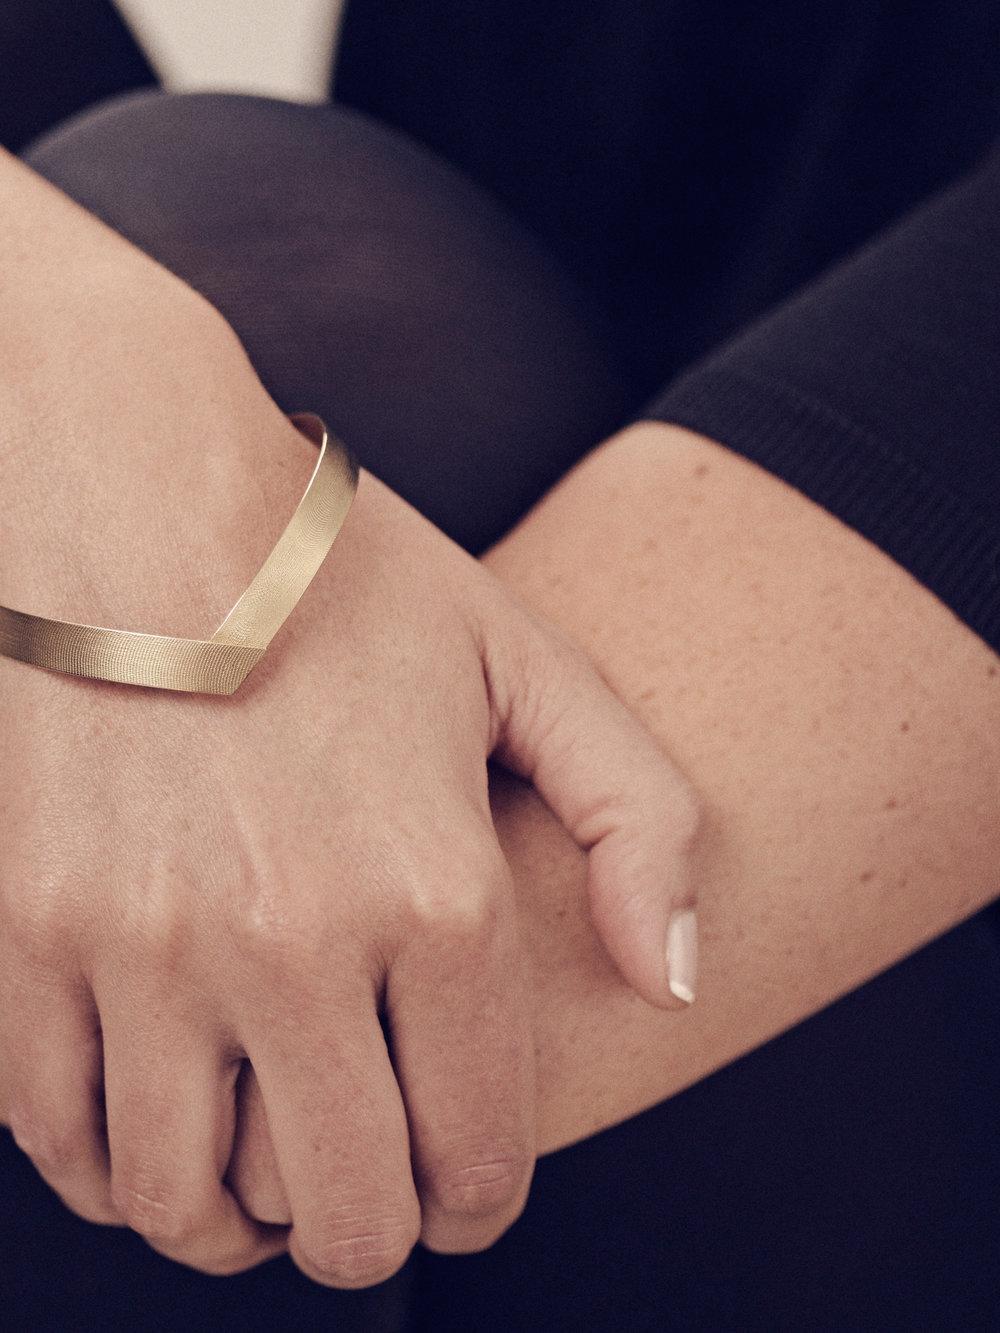 Band-Armreif, einfach in 750 Gold mit Seidenstruktur/ Band-bracelet, single in 18kt gold with silk structure